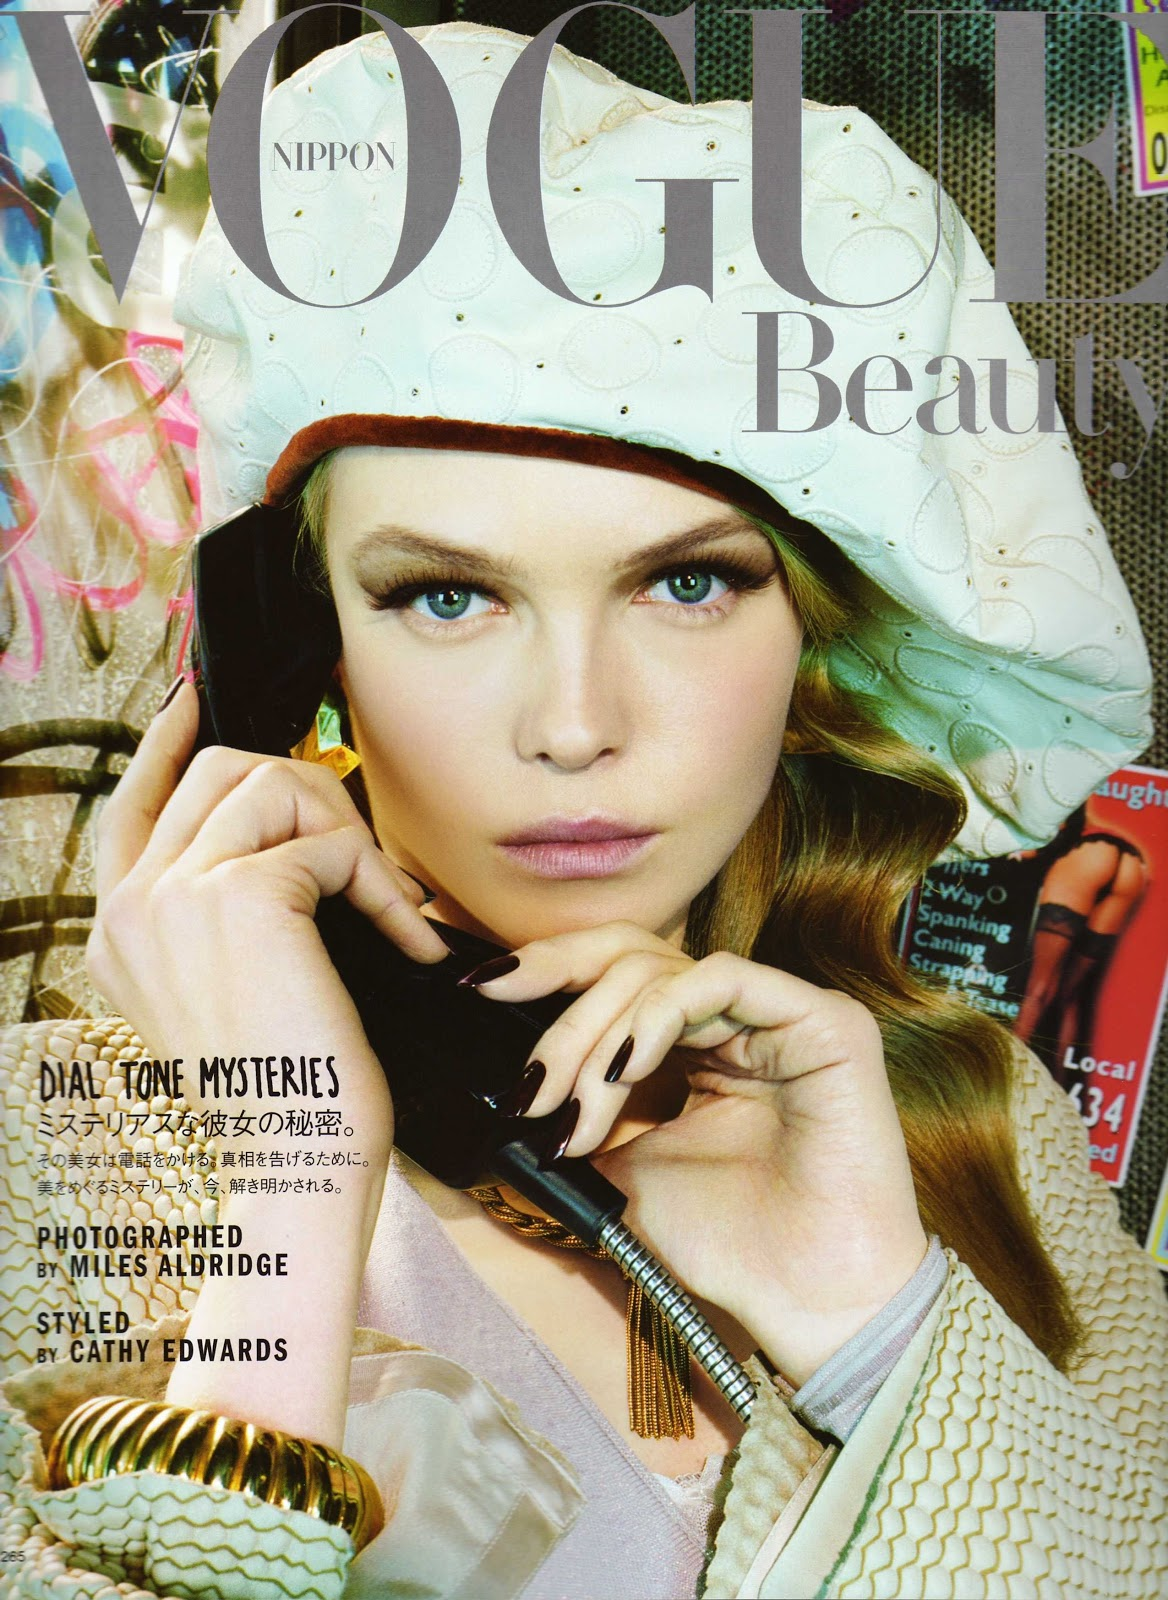 Vogue The Top Selling Fashion Magazine: Fashion Sonnets: VOGUE-licious